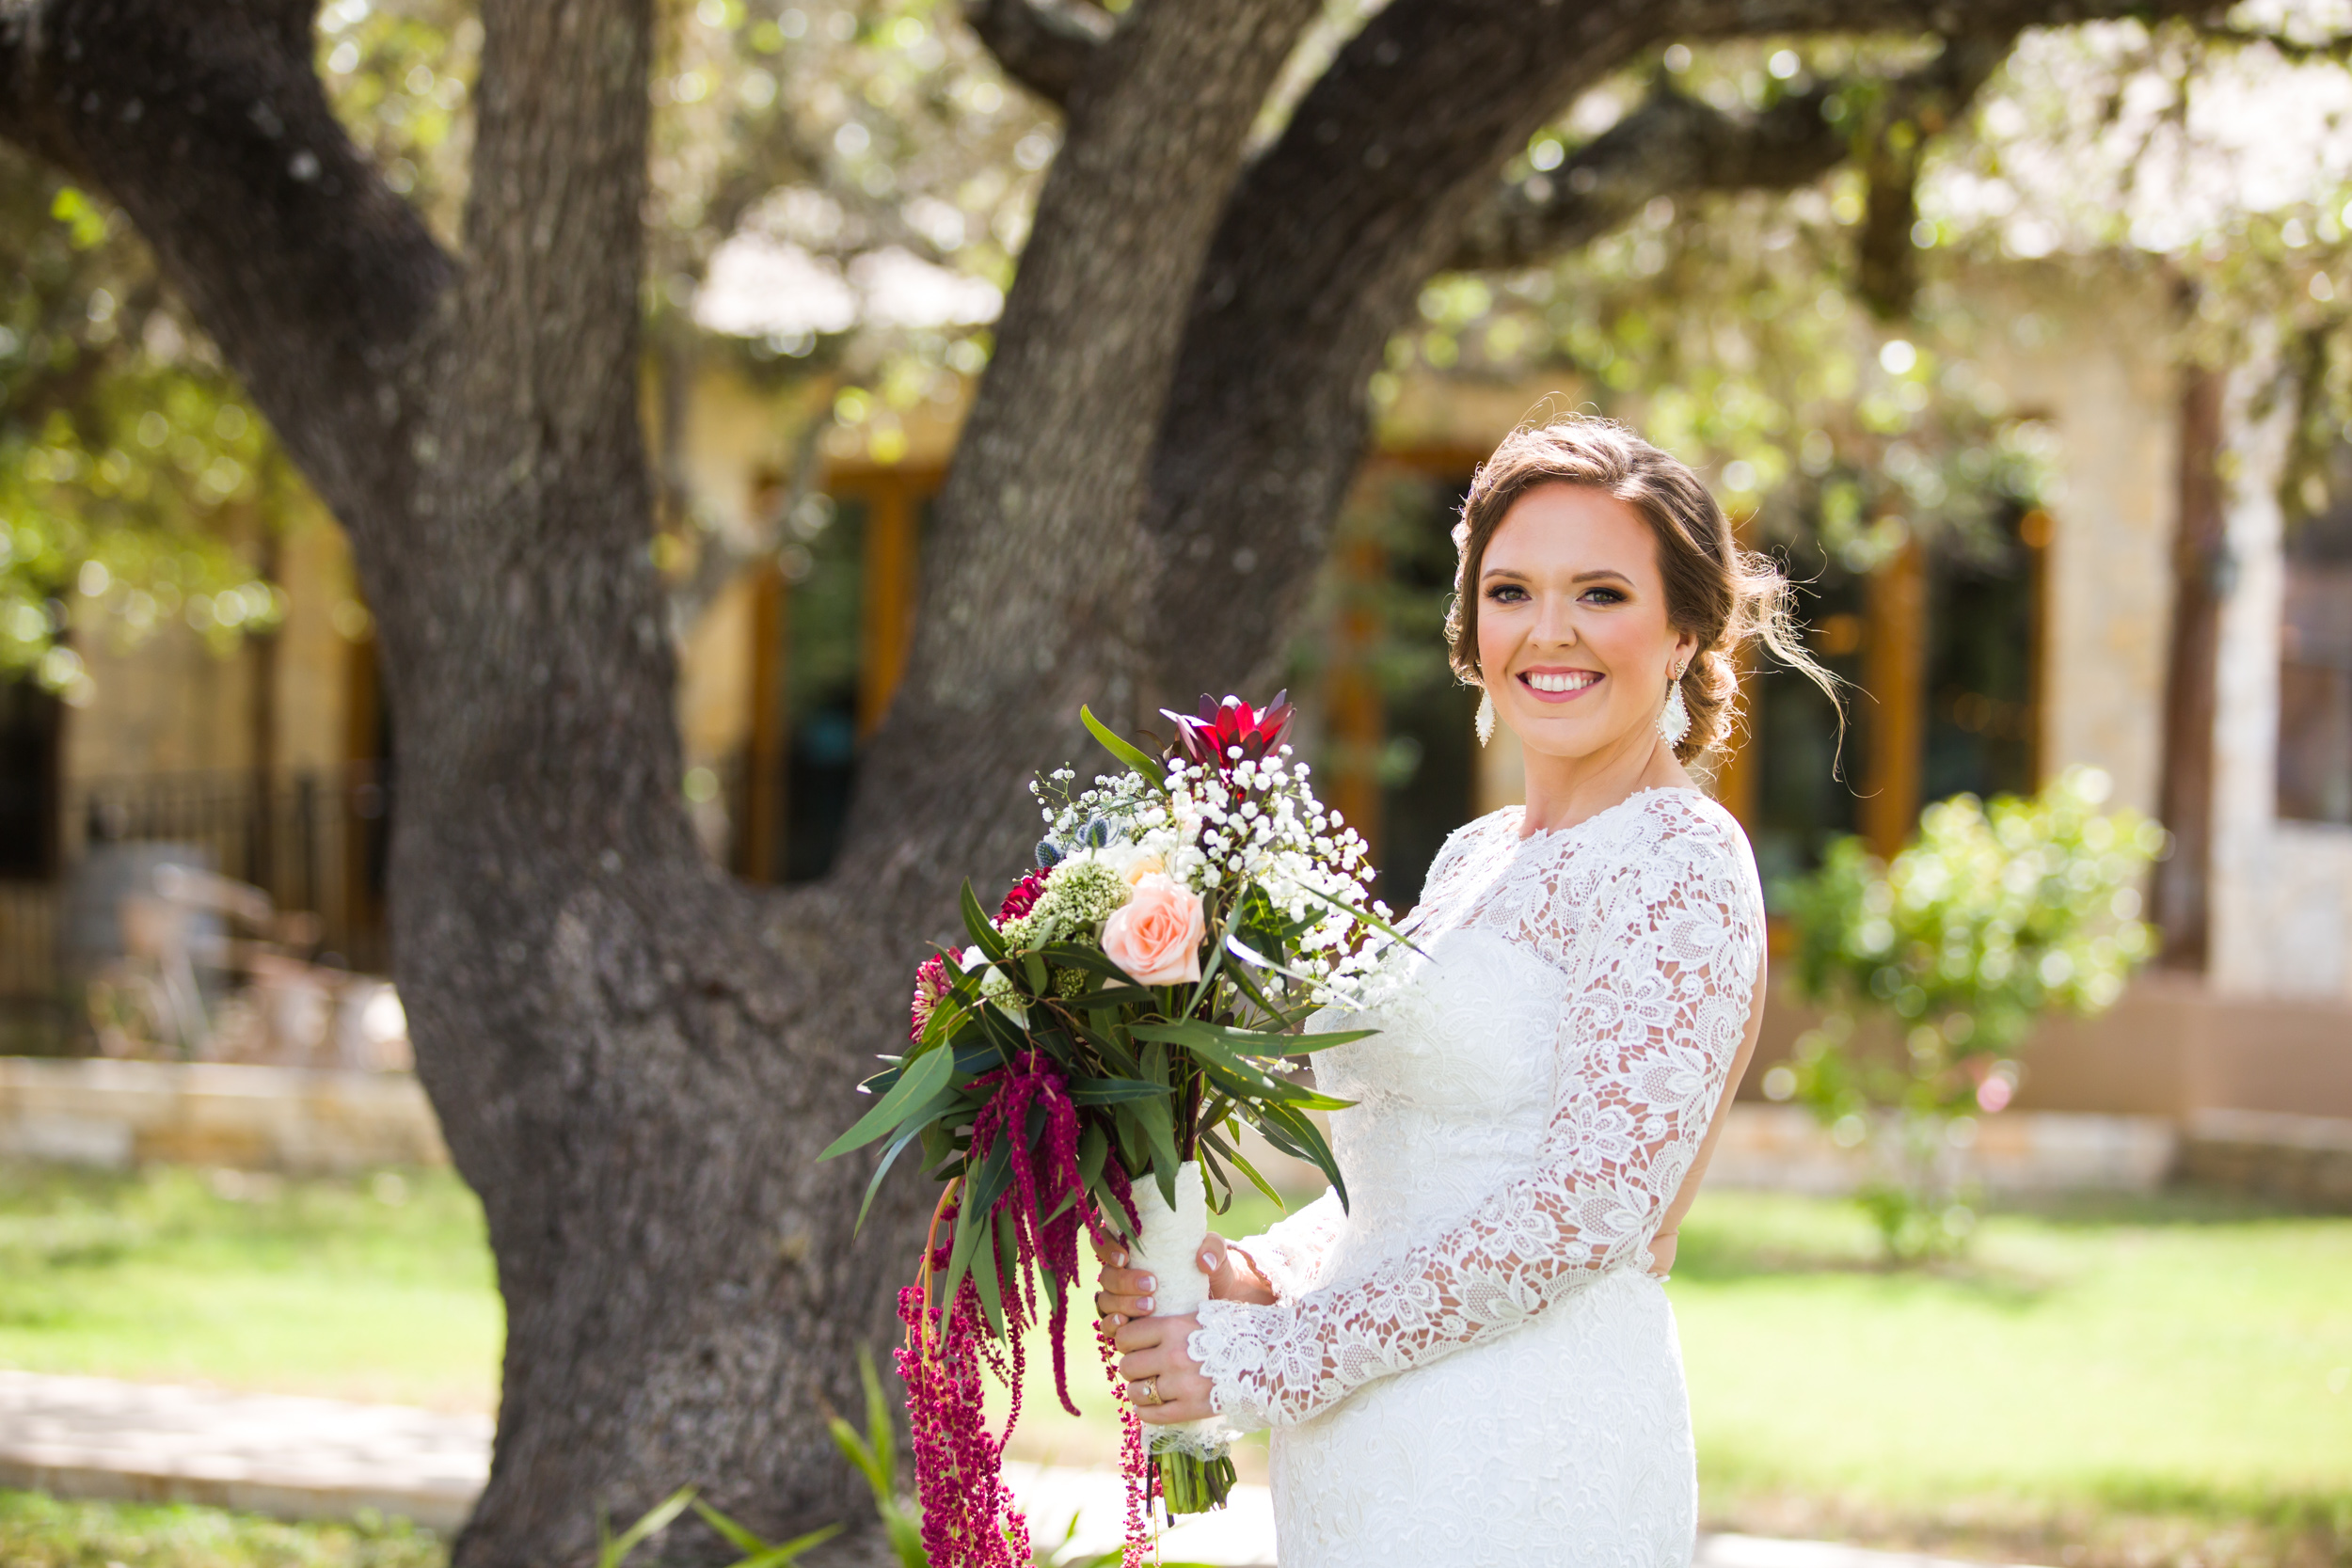 austin-wedding-colorful-12.jpg